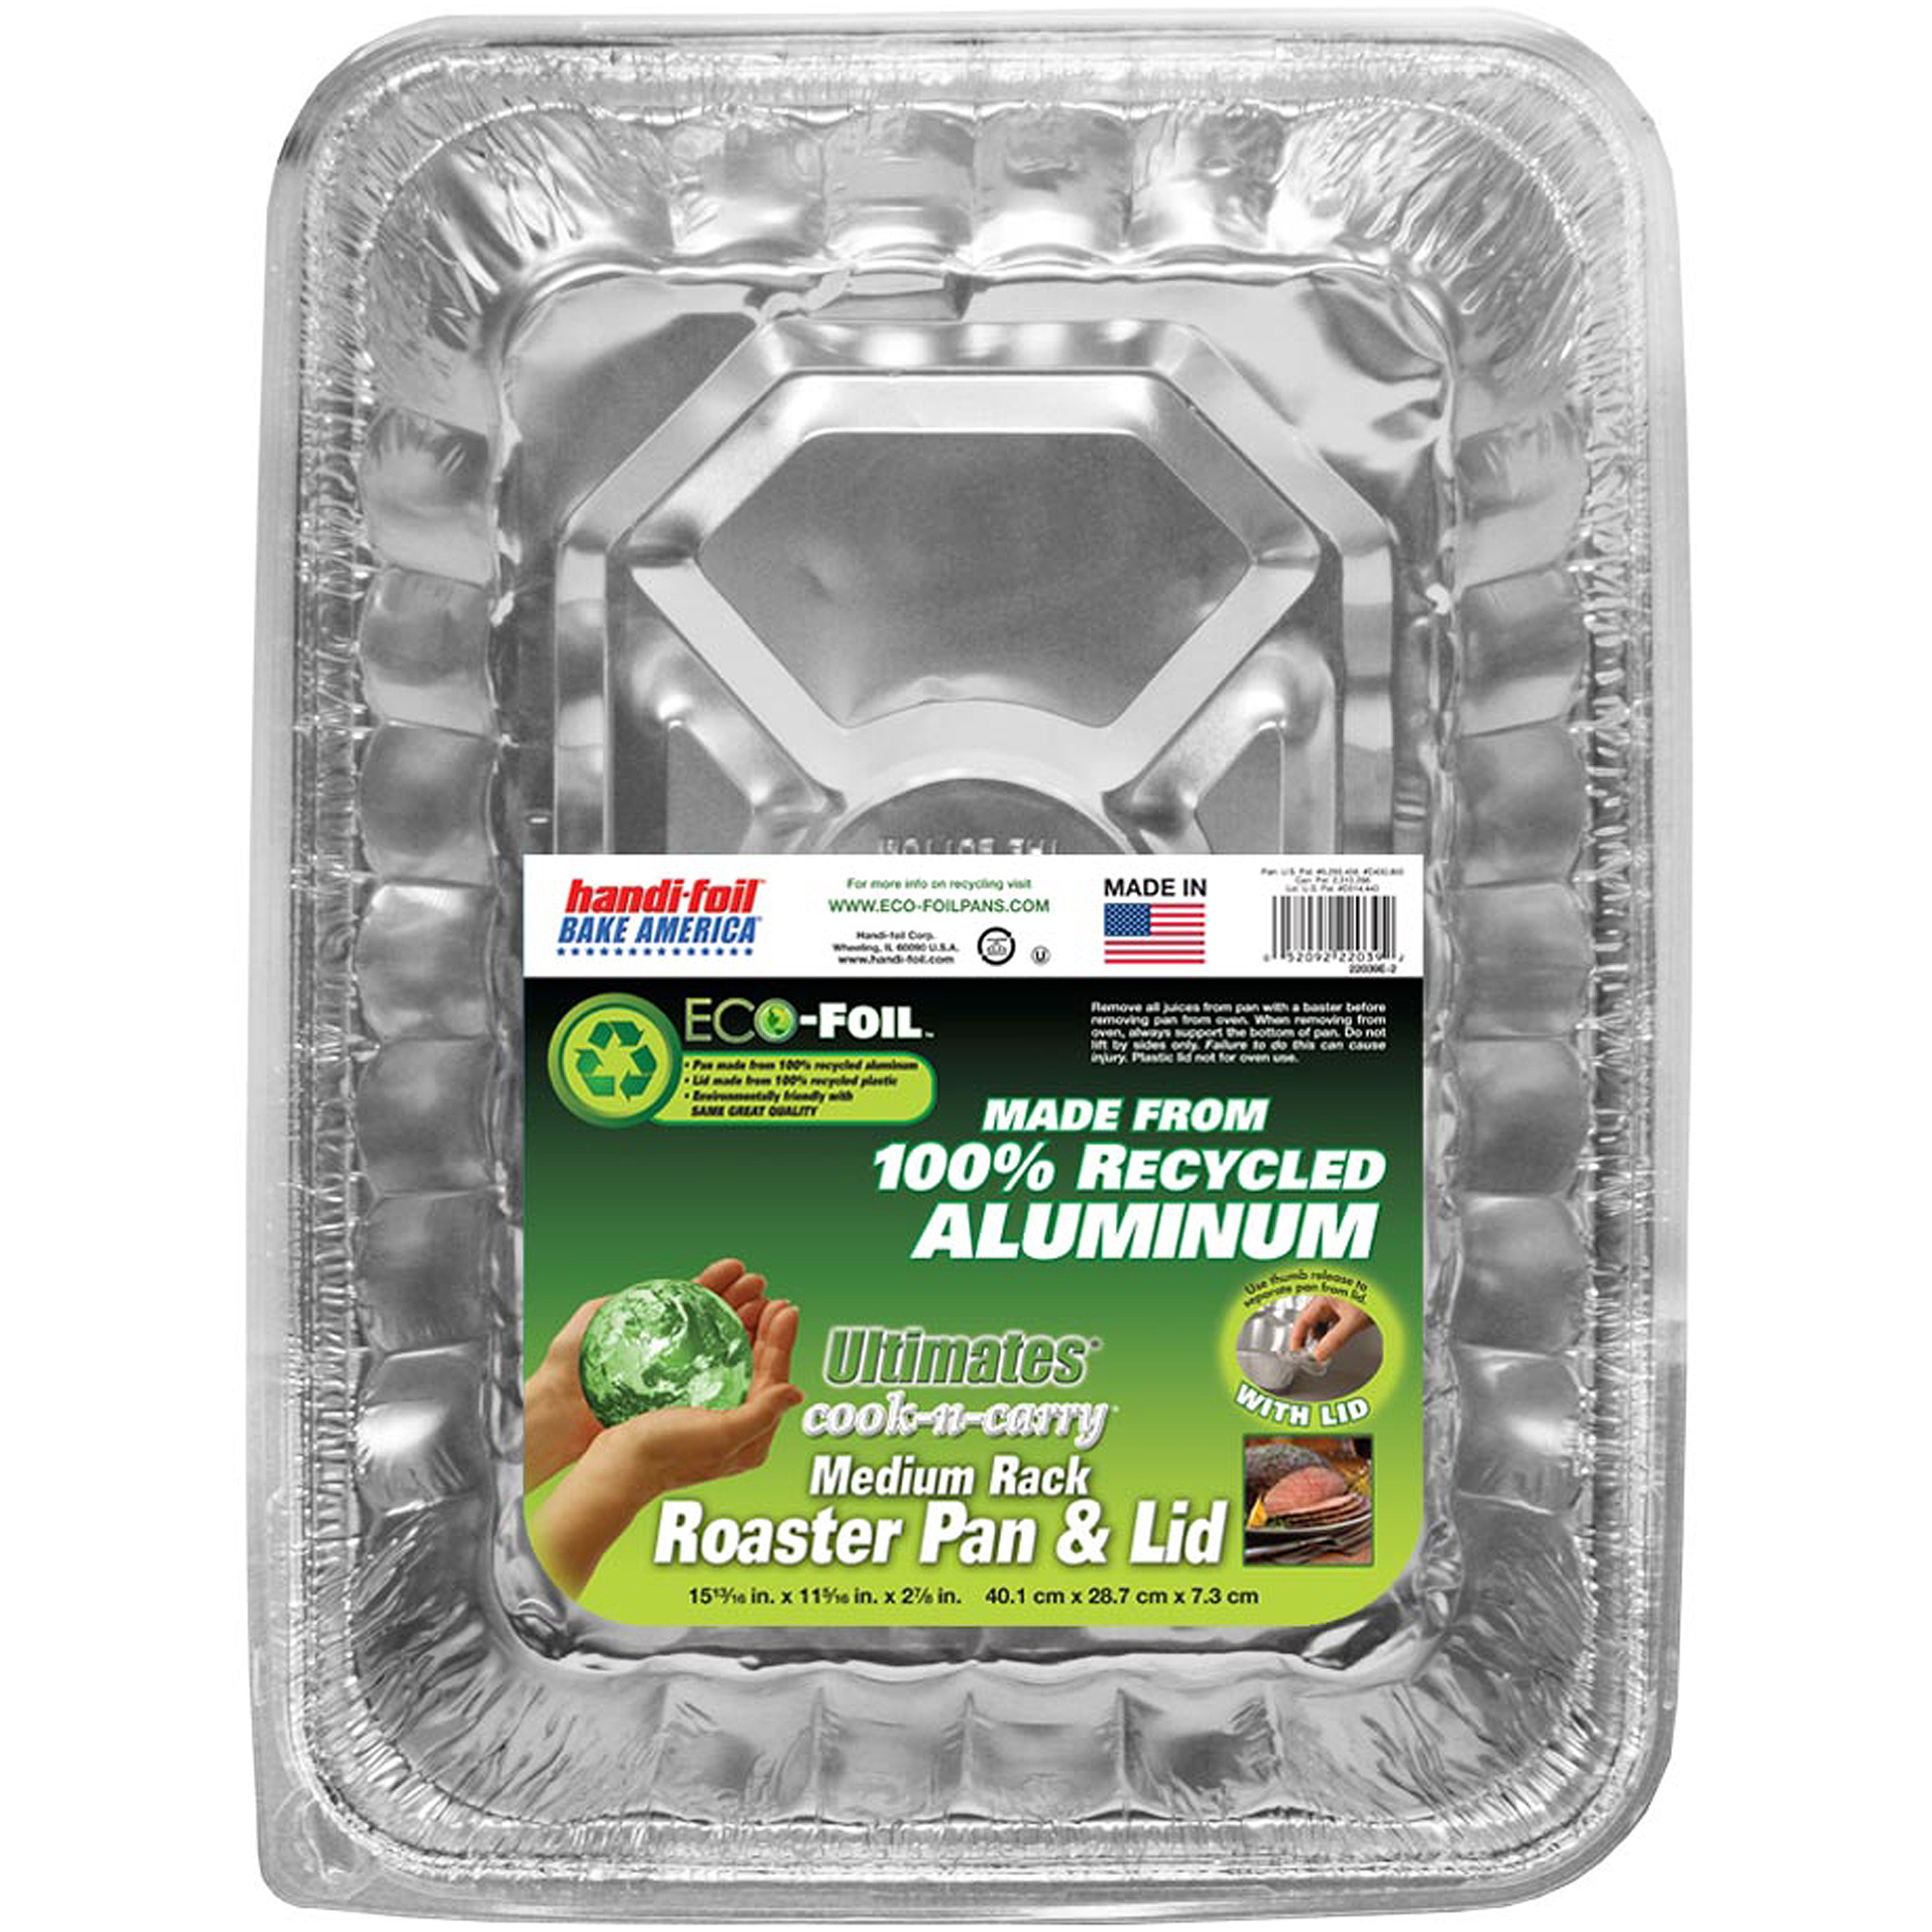 Handi-Foil Medium Rack Roaster Pan and Lid